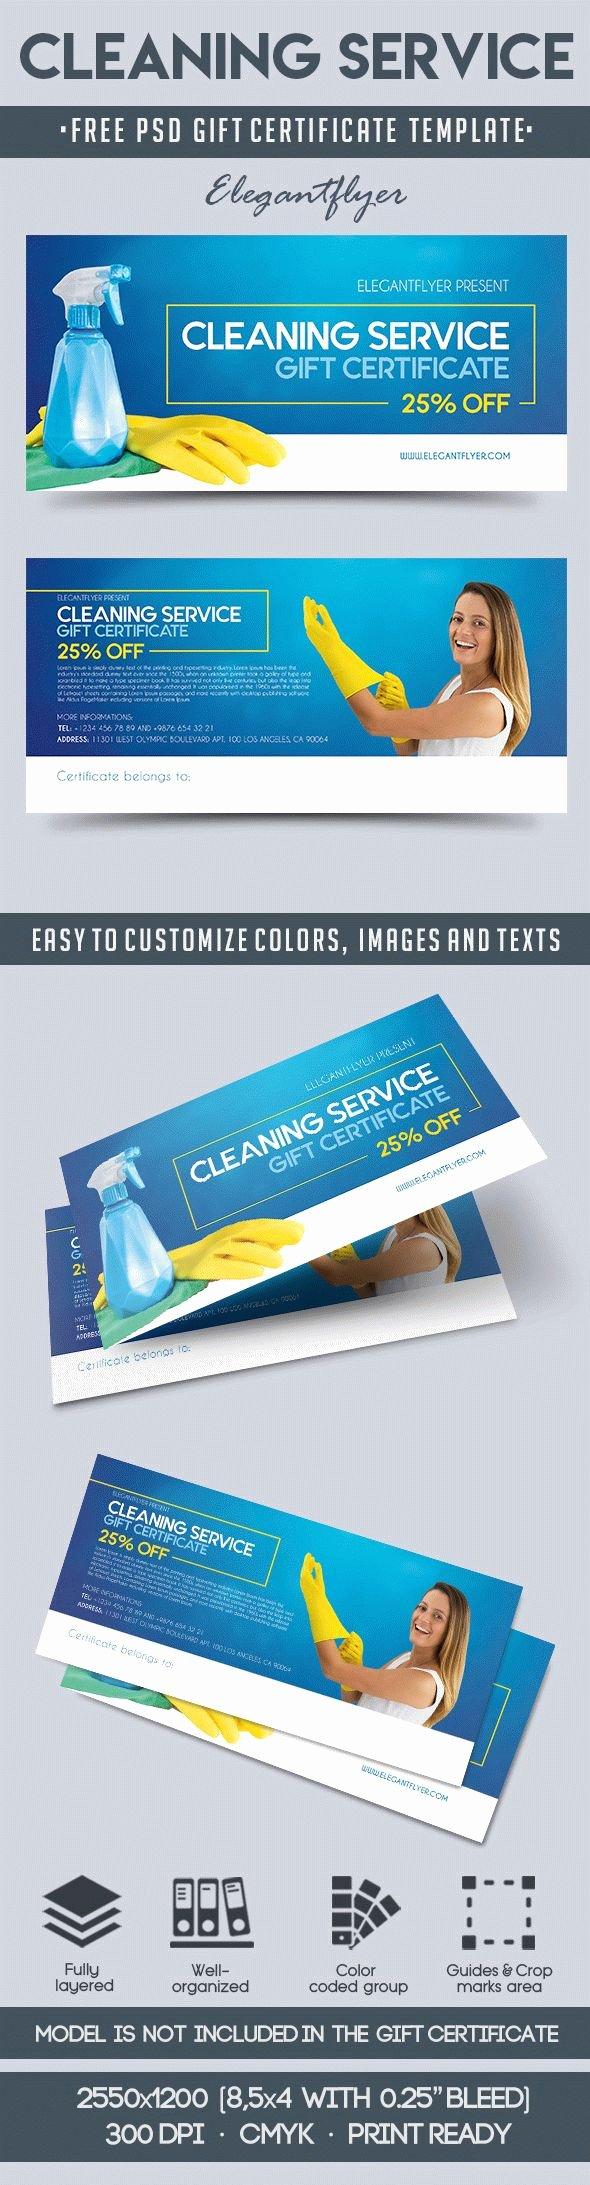 Adams Gift Certificate Template Word Luxury Cleaning Service – Free Gift Certificate Psd Template – by